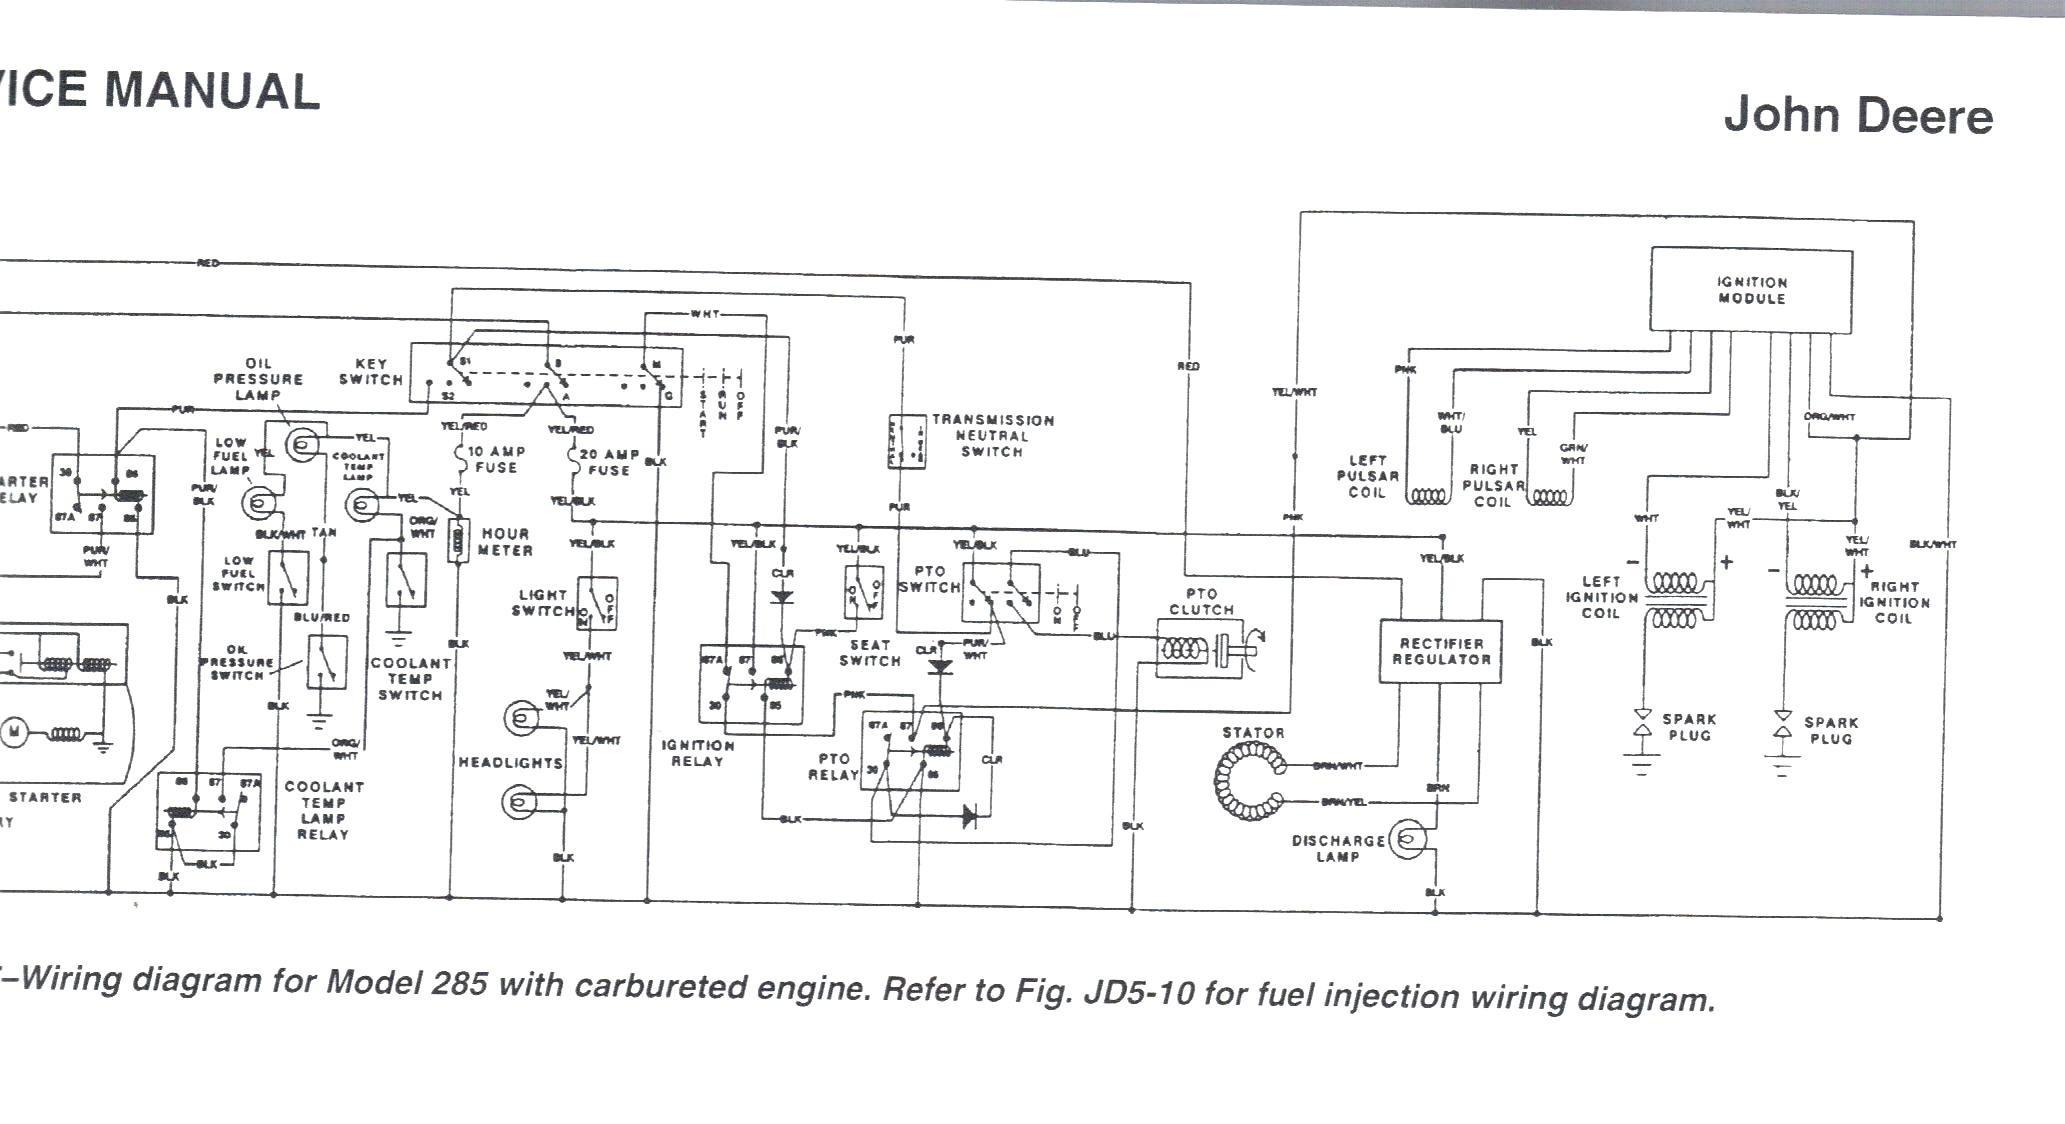 John Deere Lt155 Wiring Schematic Diagram. Lt155 Wiring Diagram John Deere Electrical. John Deere. Gx345 John Deere Key Switch Schematic At Scoala.co